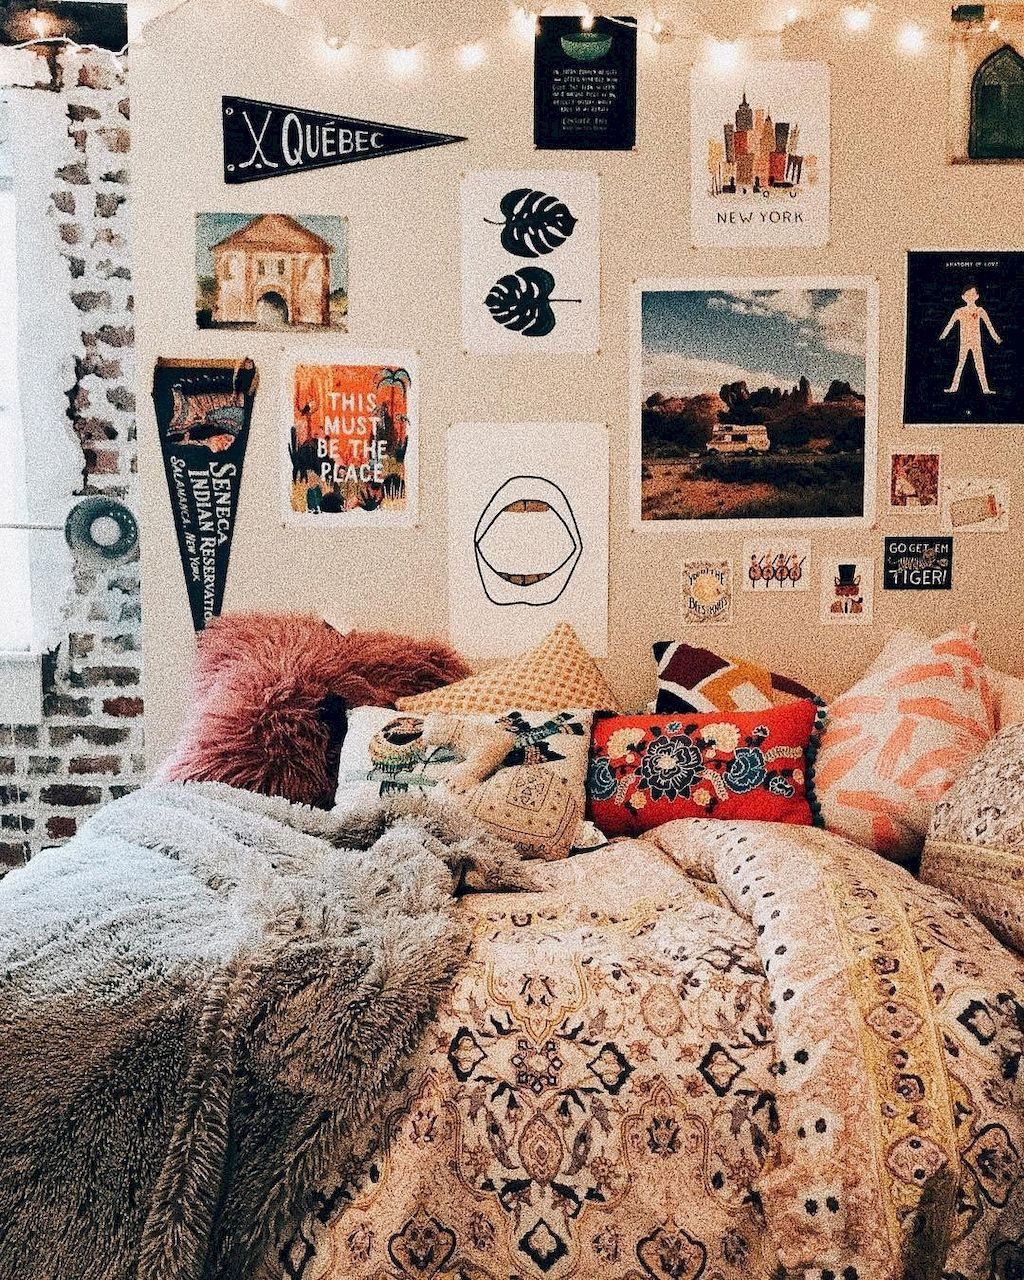 Cute Dorm Room Decorating Ideas On A Budget 22 Dorm Room Decor Cute Dorm Rooms Room Inspiration